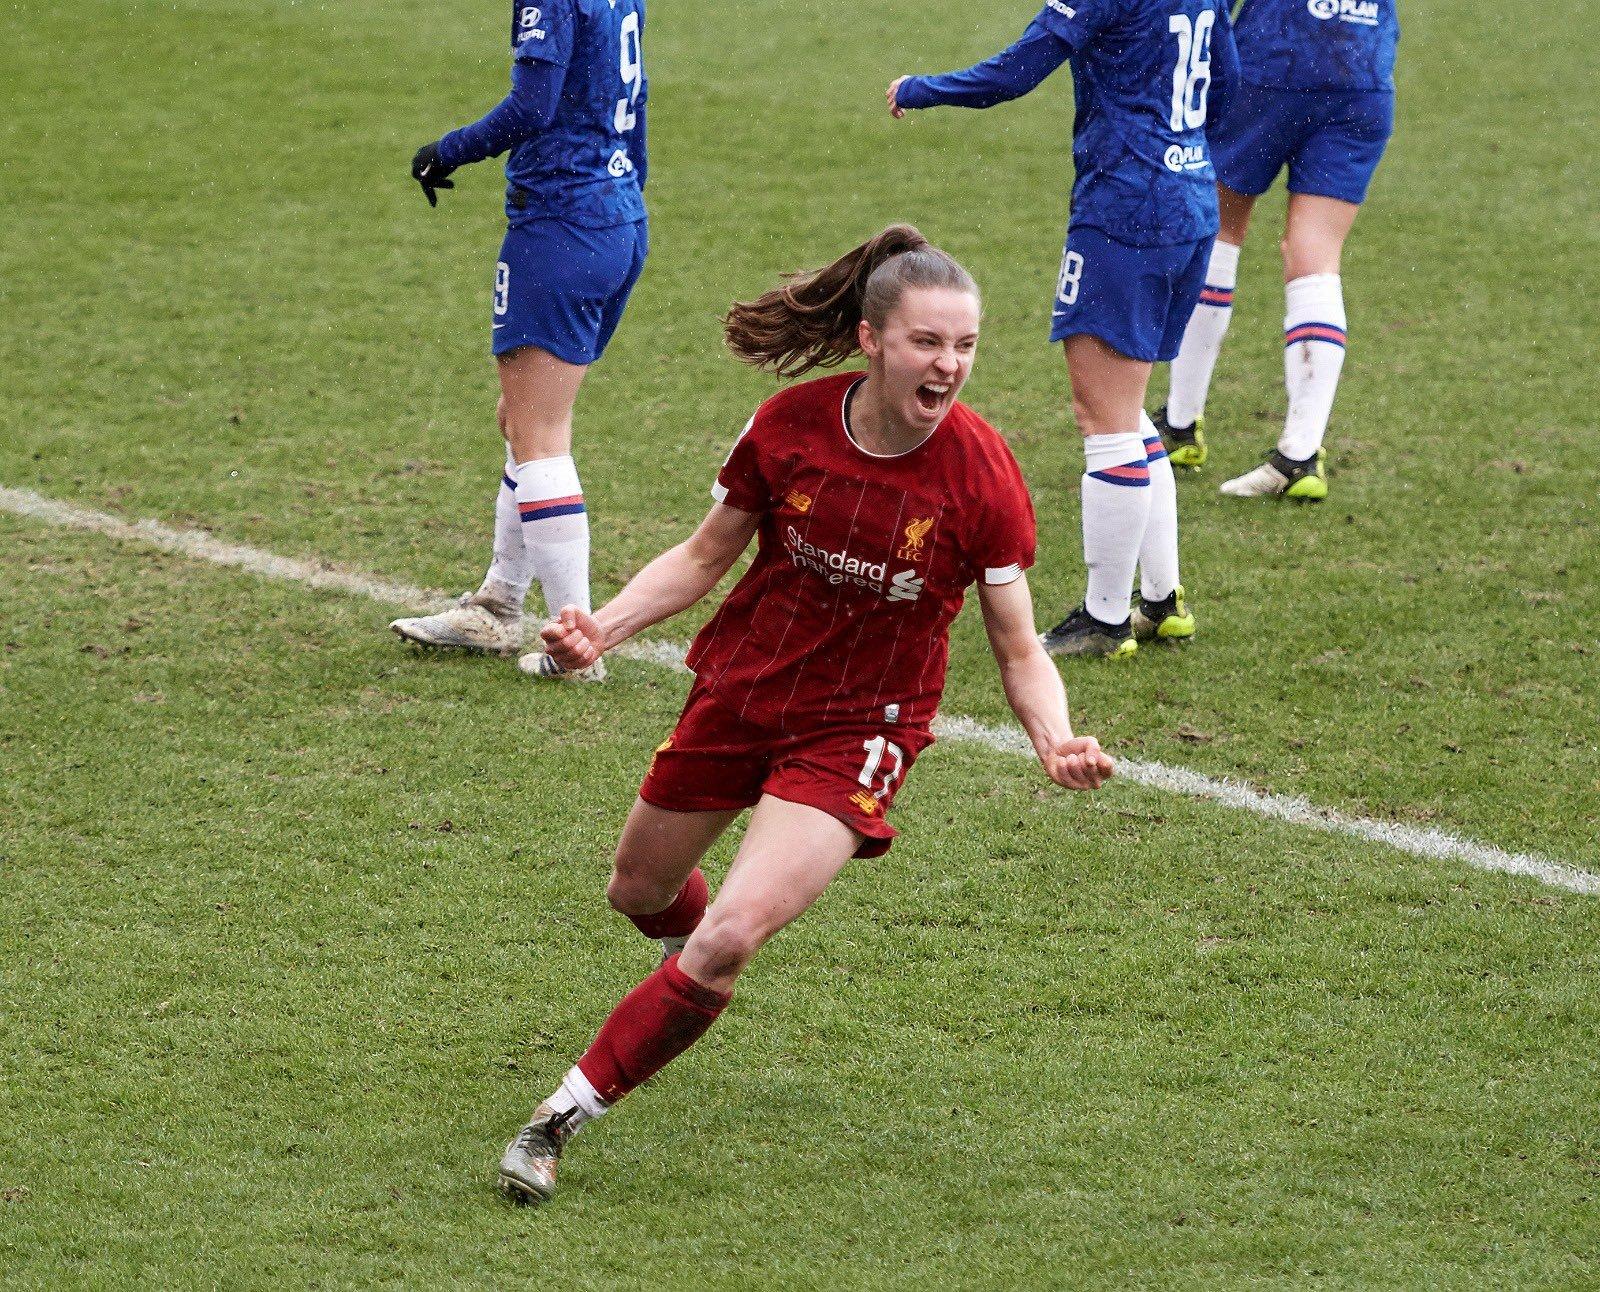 Niahm Charles marcó por tercera jornada consecutiva. / Liverpool FC